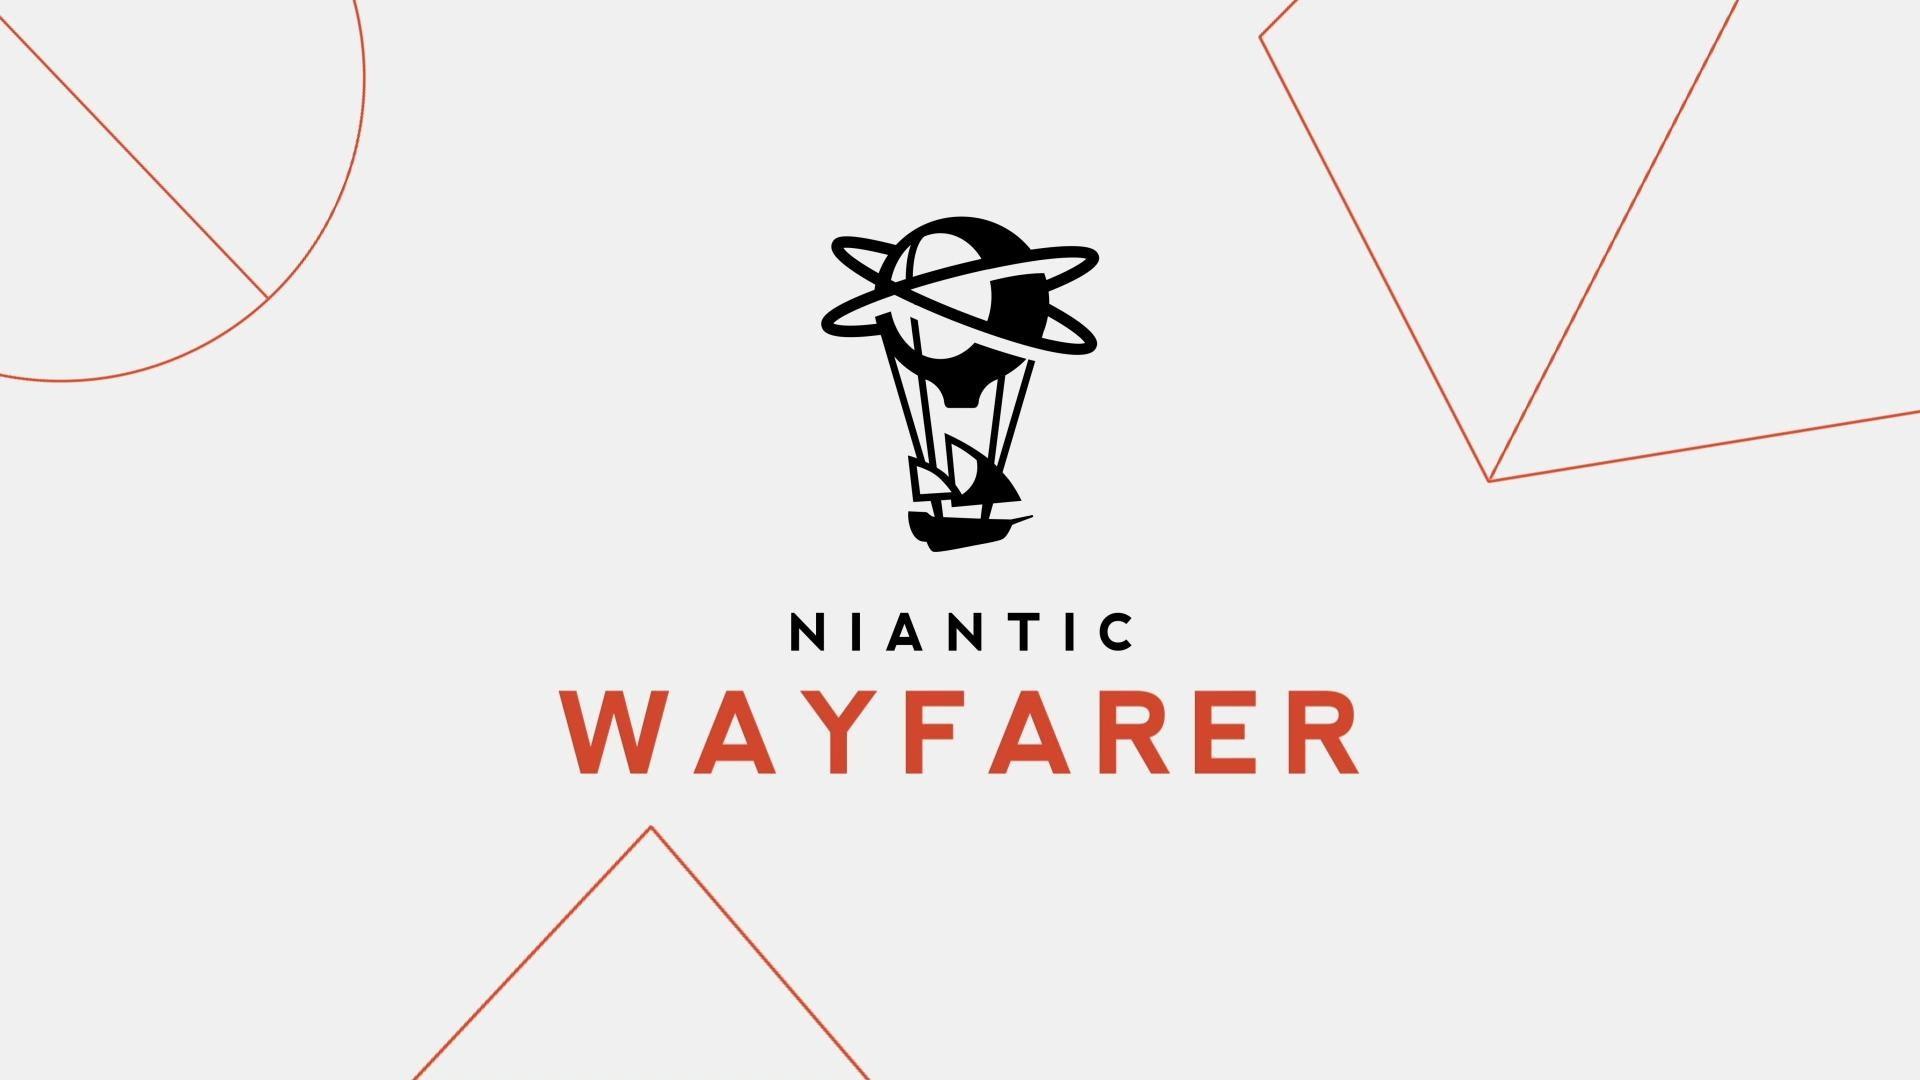 @NianticLabs